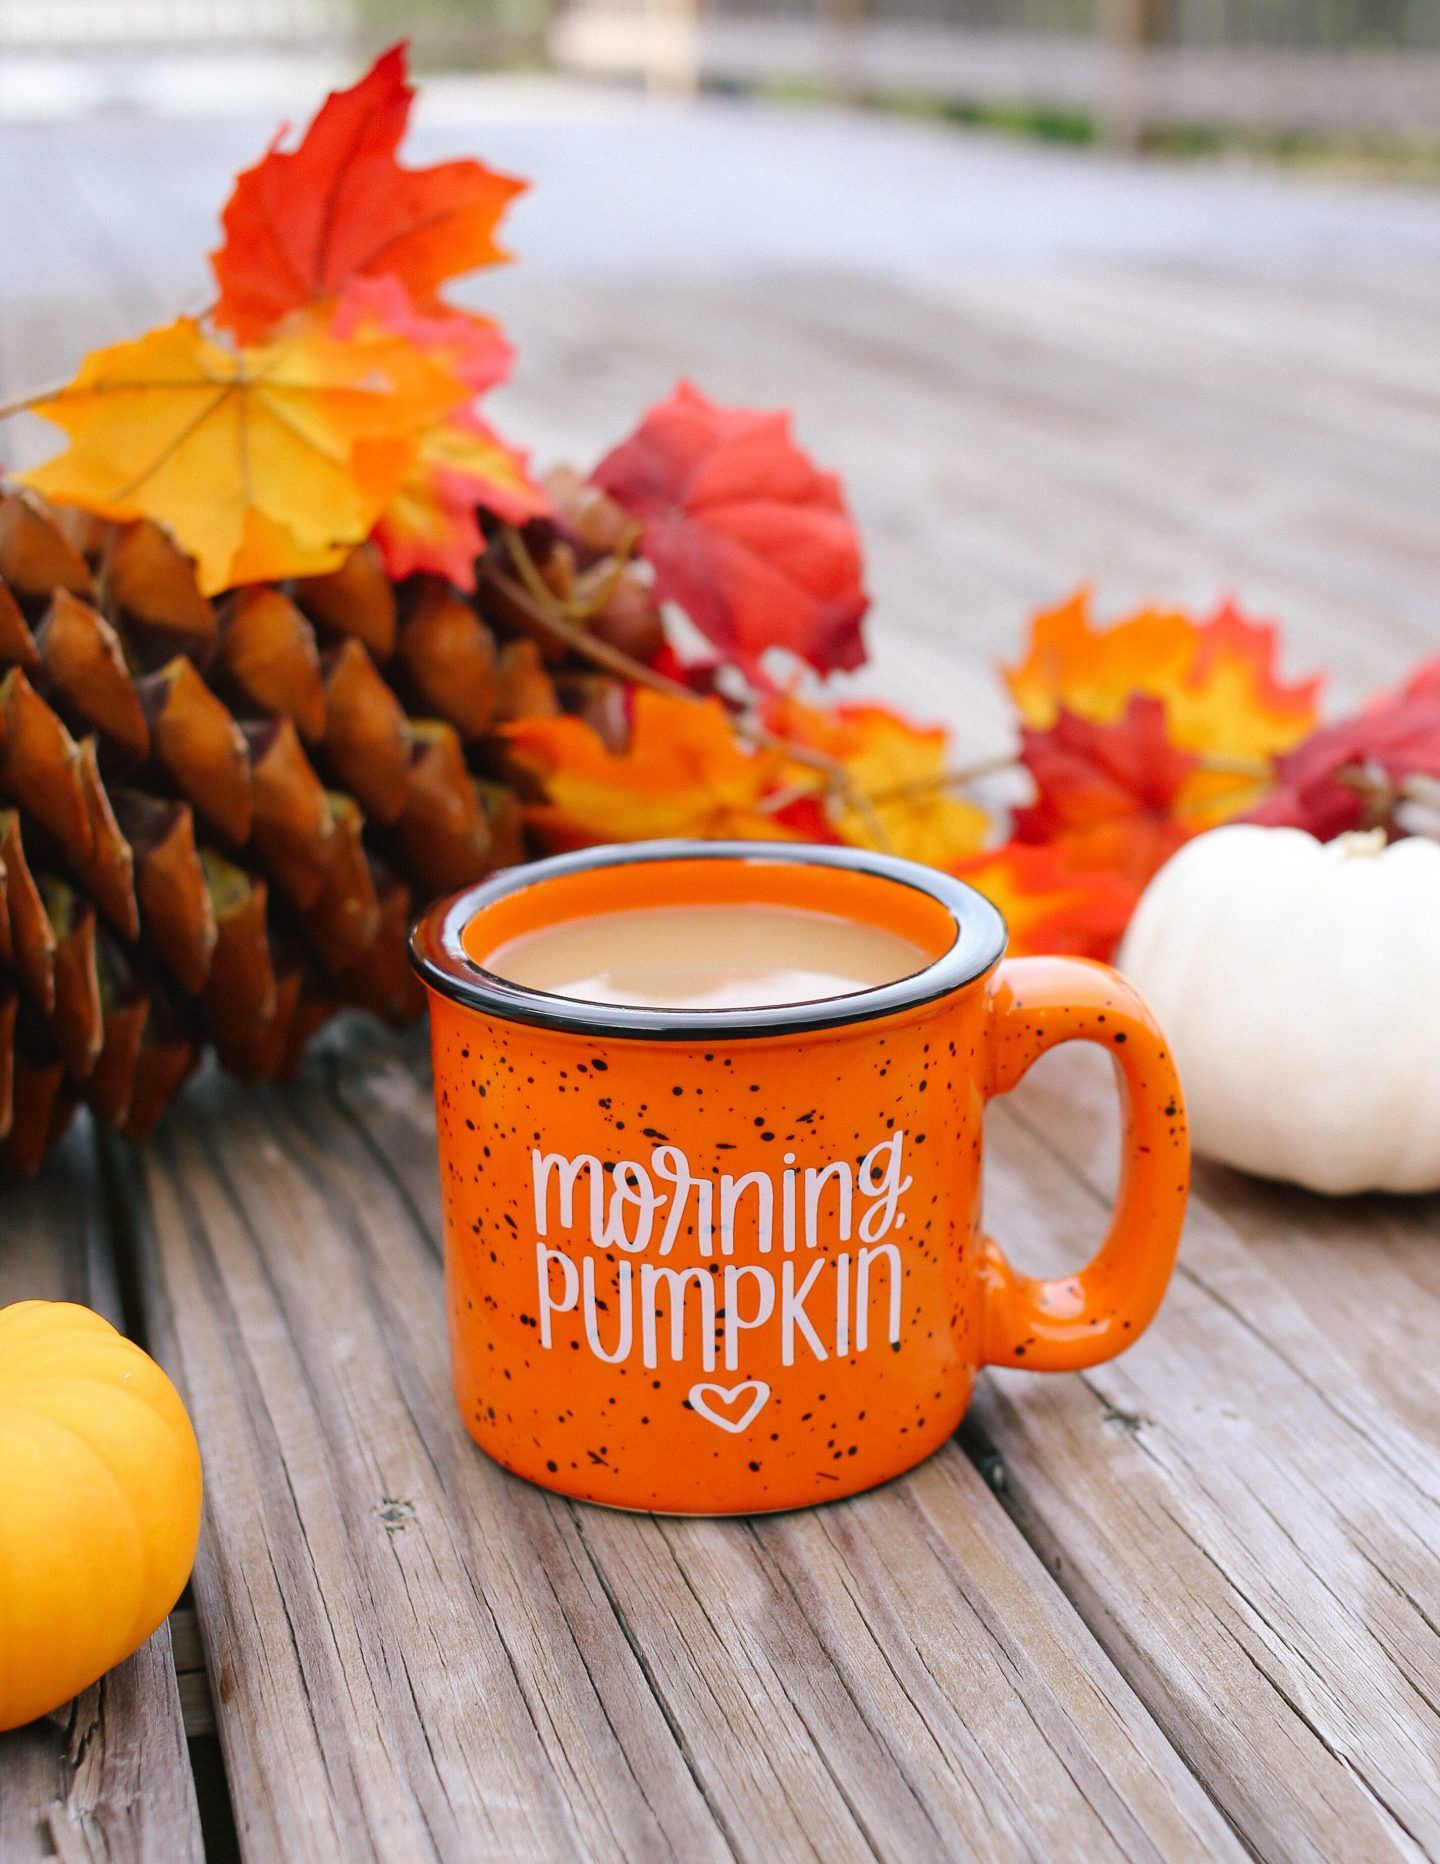 Disney Home Decor Ideas for Fall in 2020 Autumn coffee